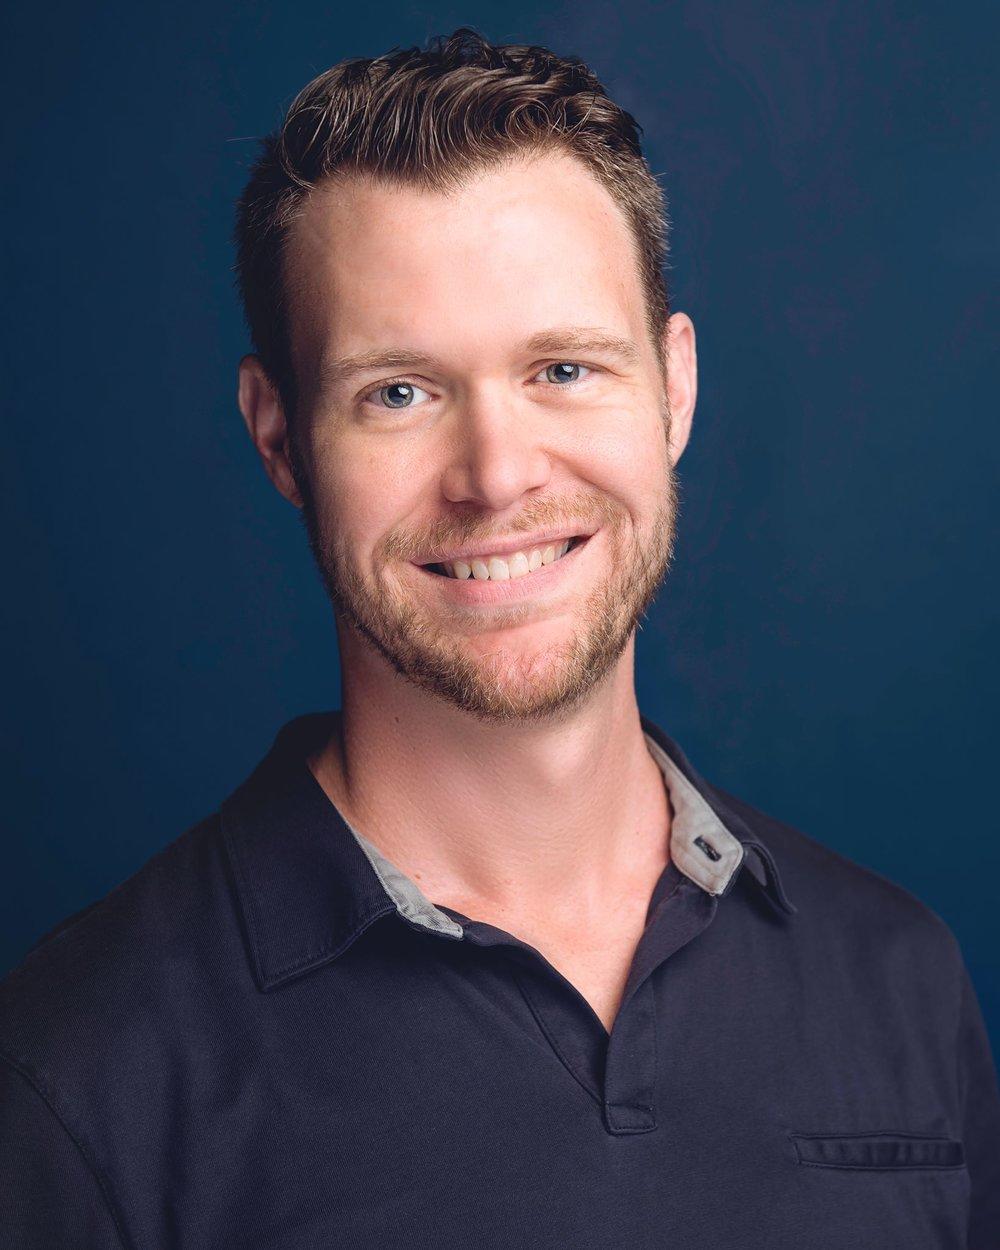 Corey Whaley